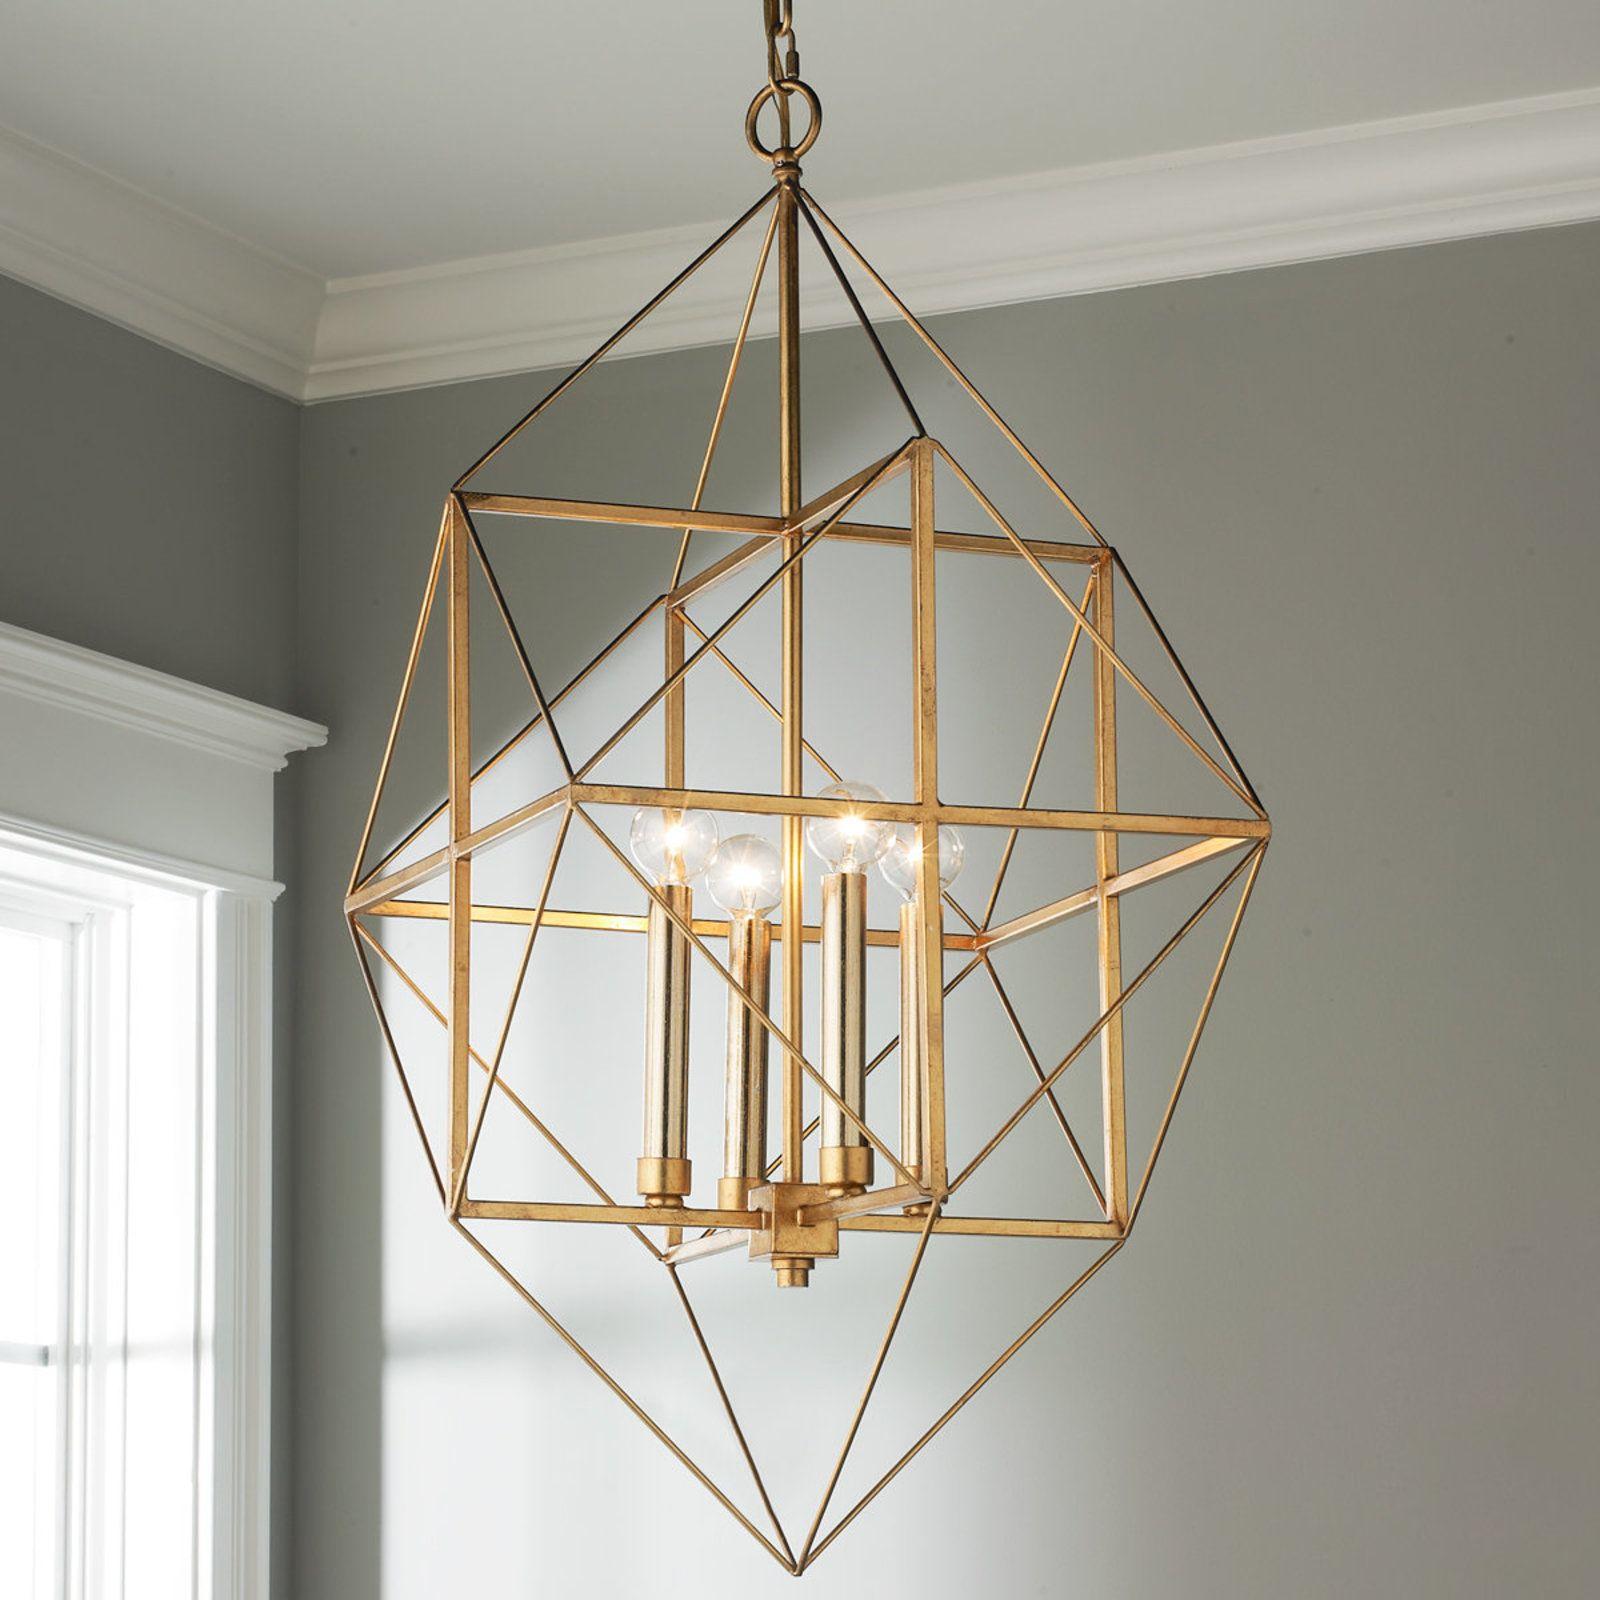 Geometric Gold and Silver Leaf Lantern Small